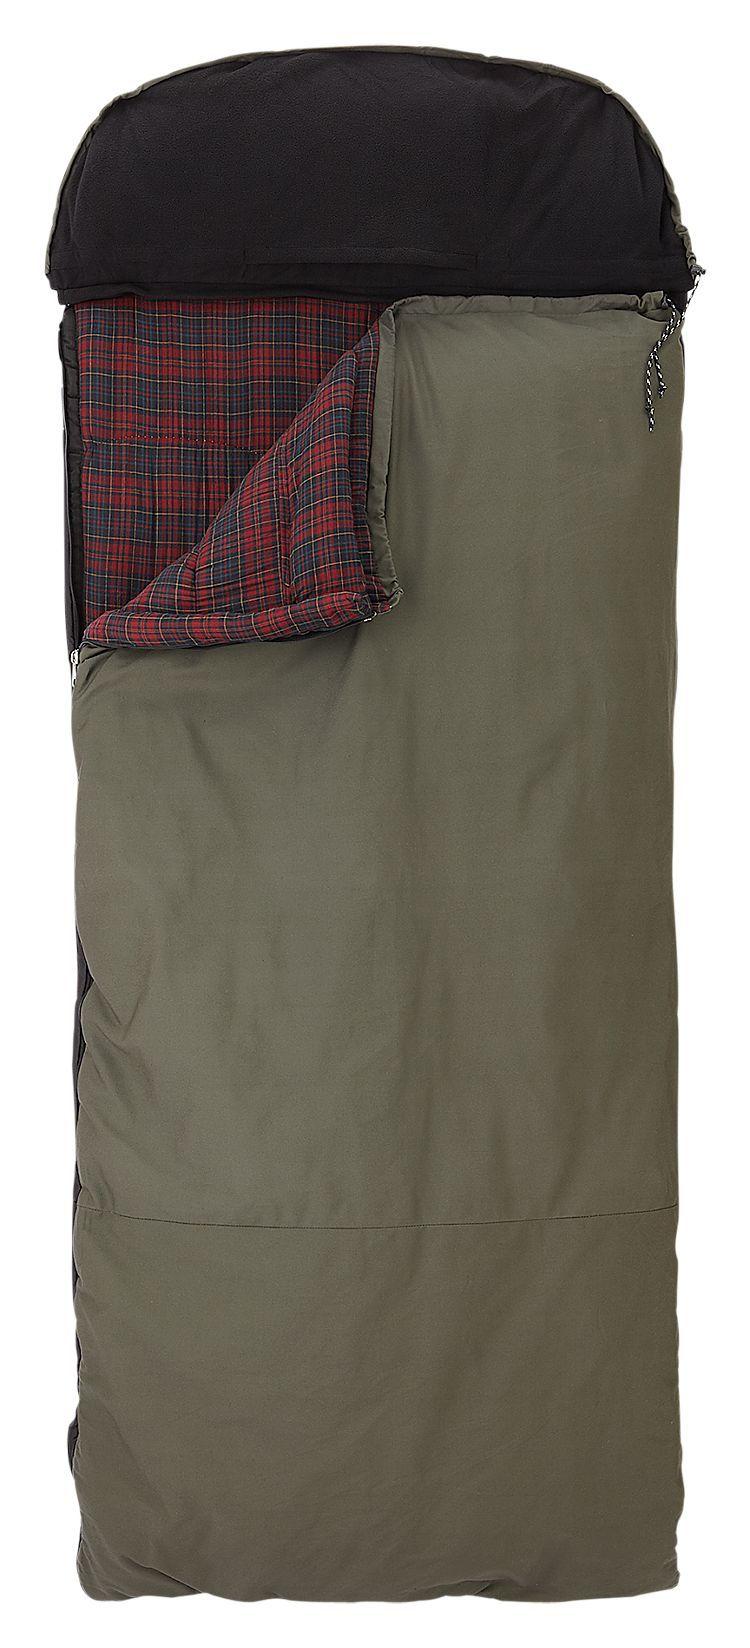 Bass Pro S 20º Oversized Sleeping Bag With Hood